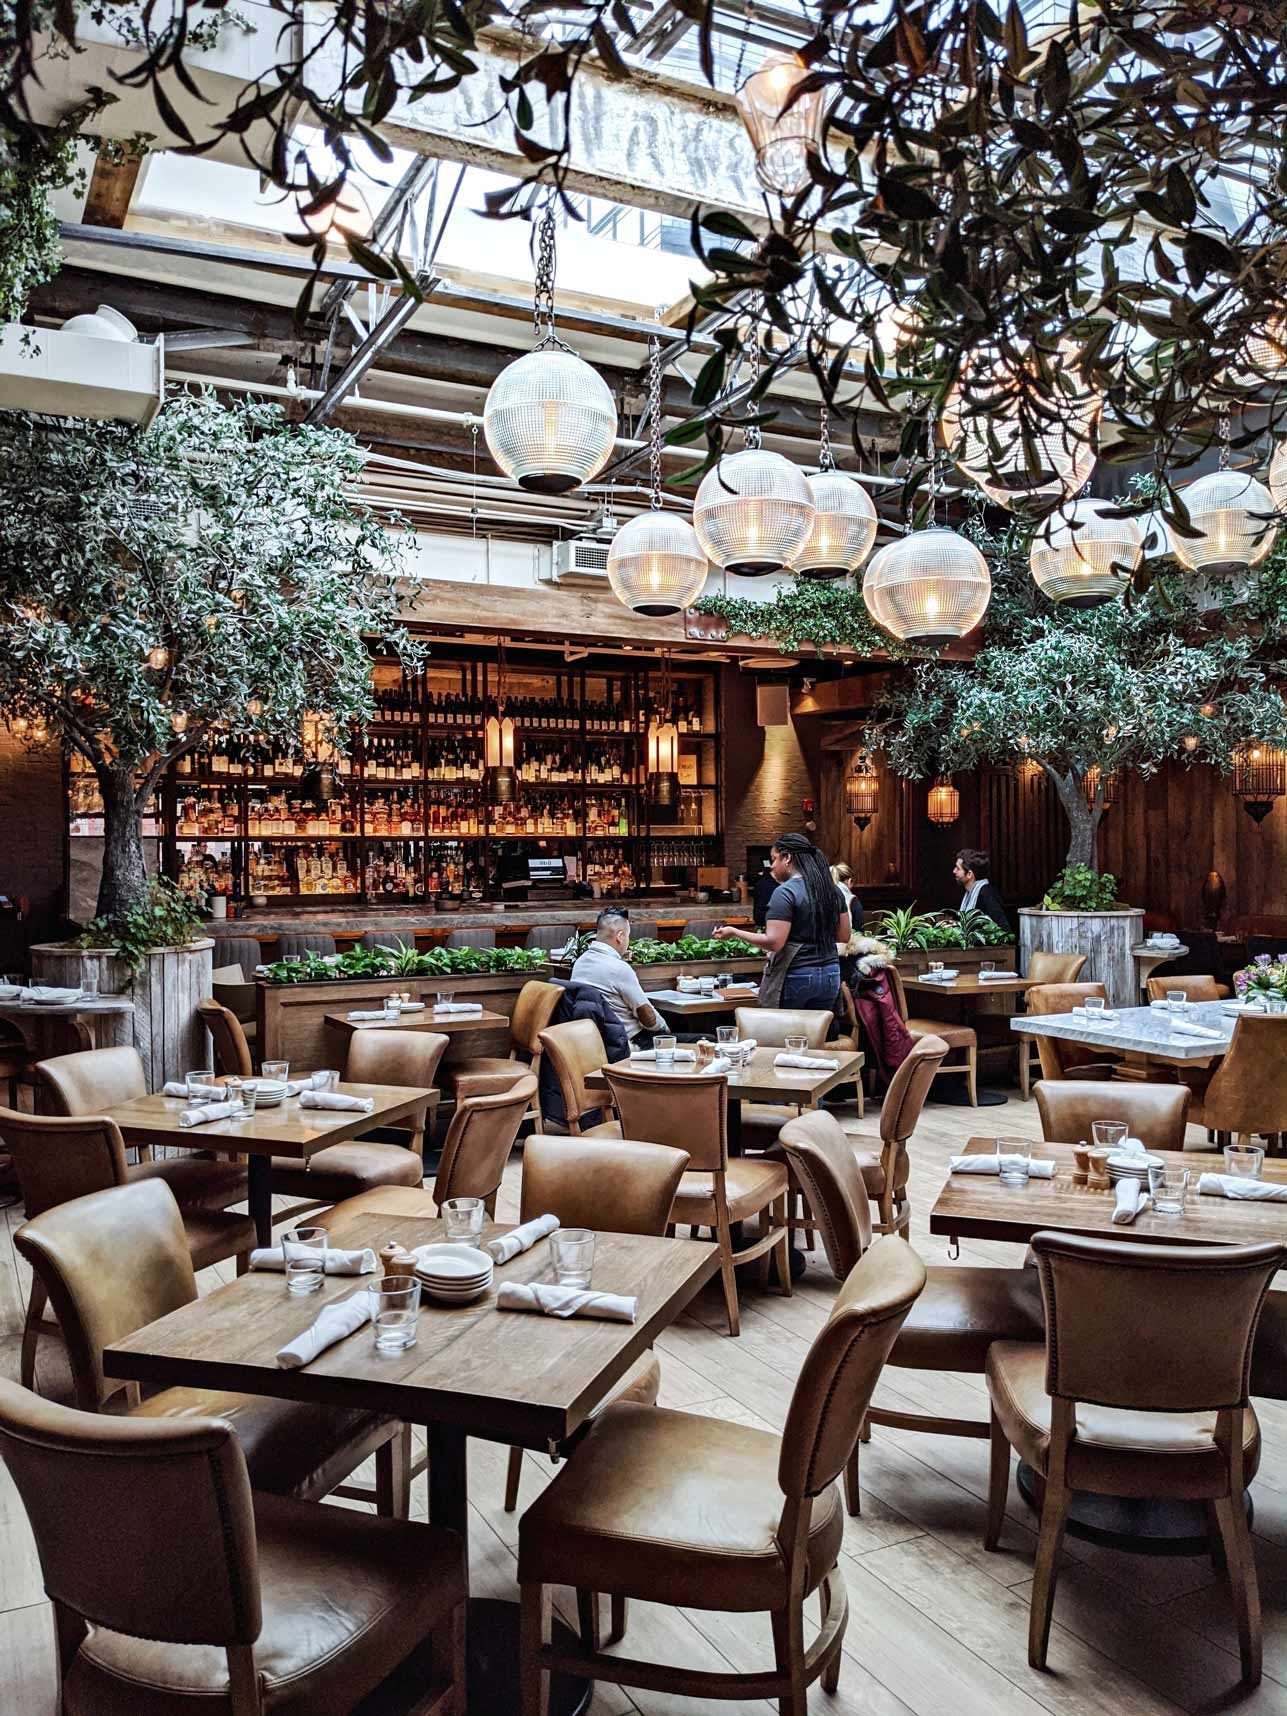 Aba Restaurant Indoor Dining Space